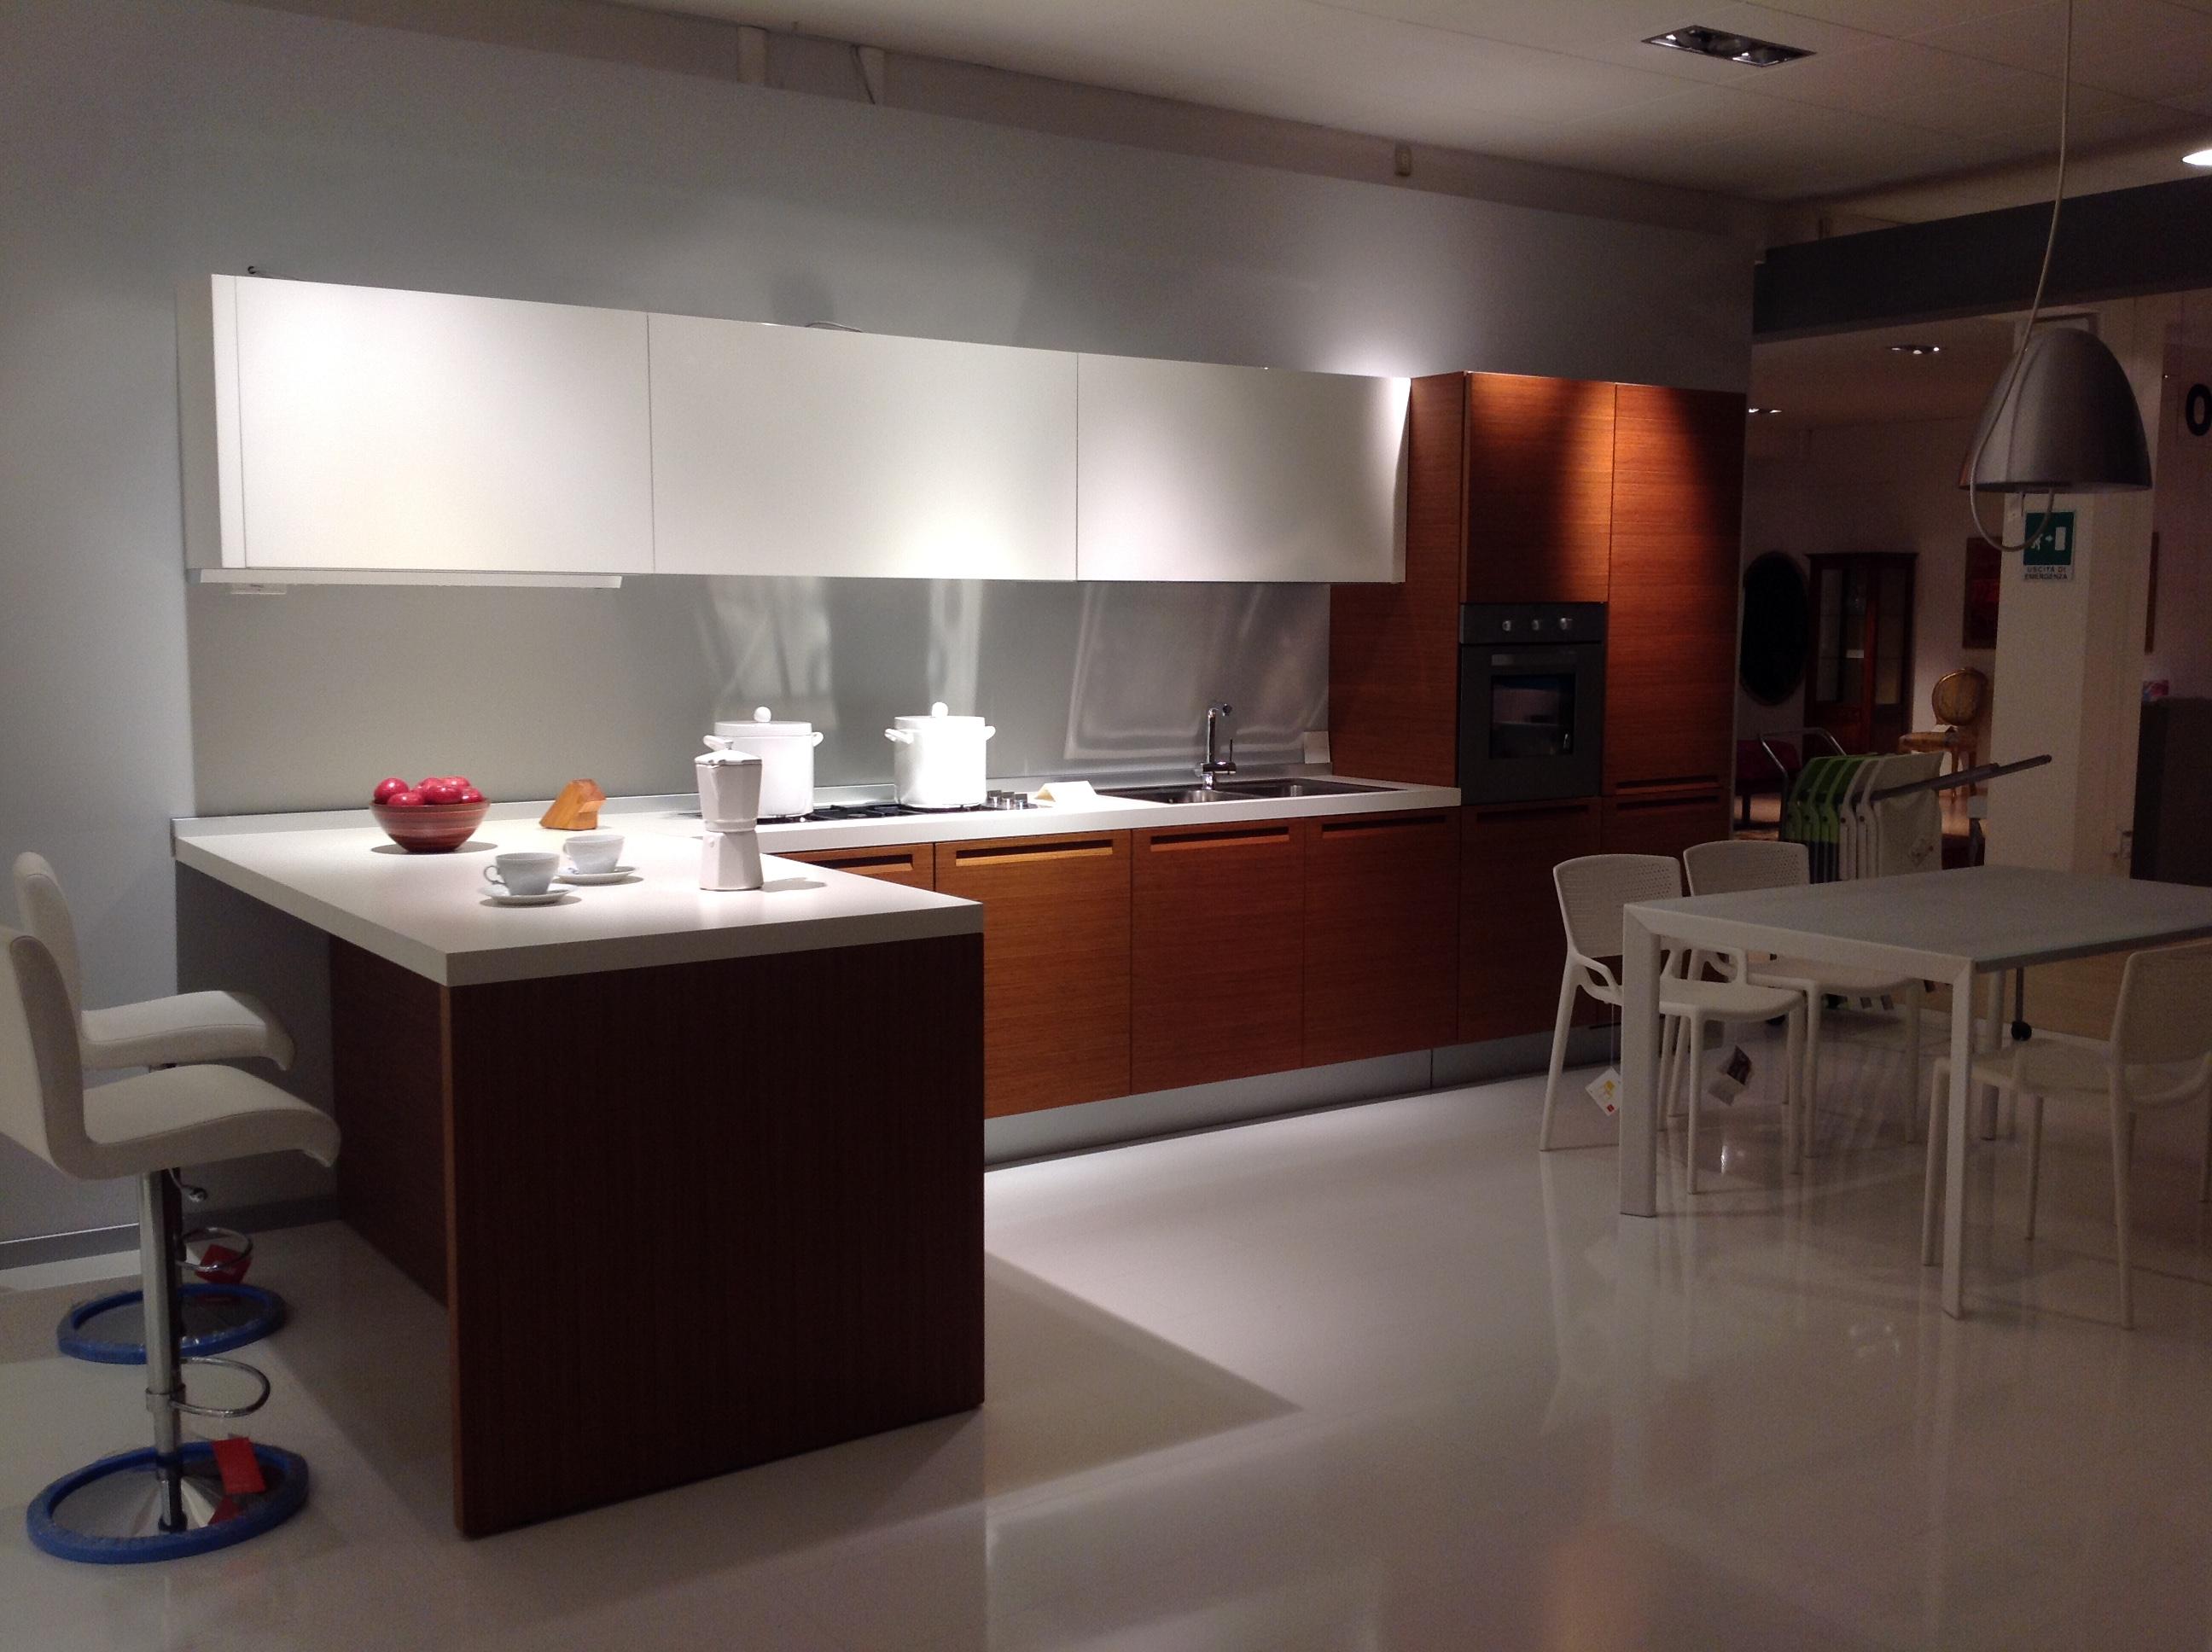 Cucina Minimal di Poliform Design CR&S Varenna - Arredamento & design